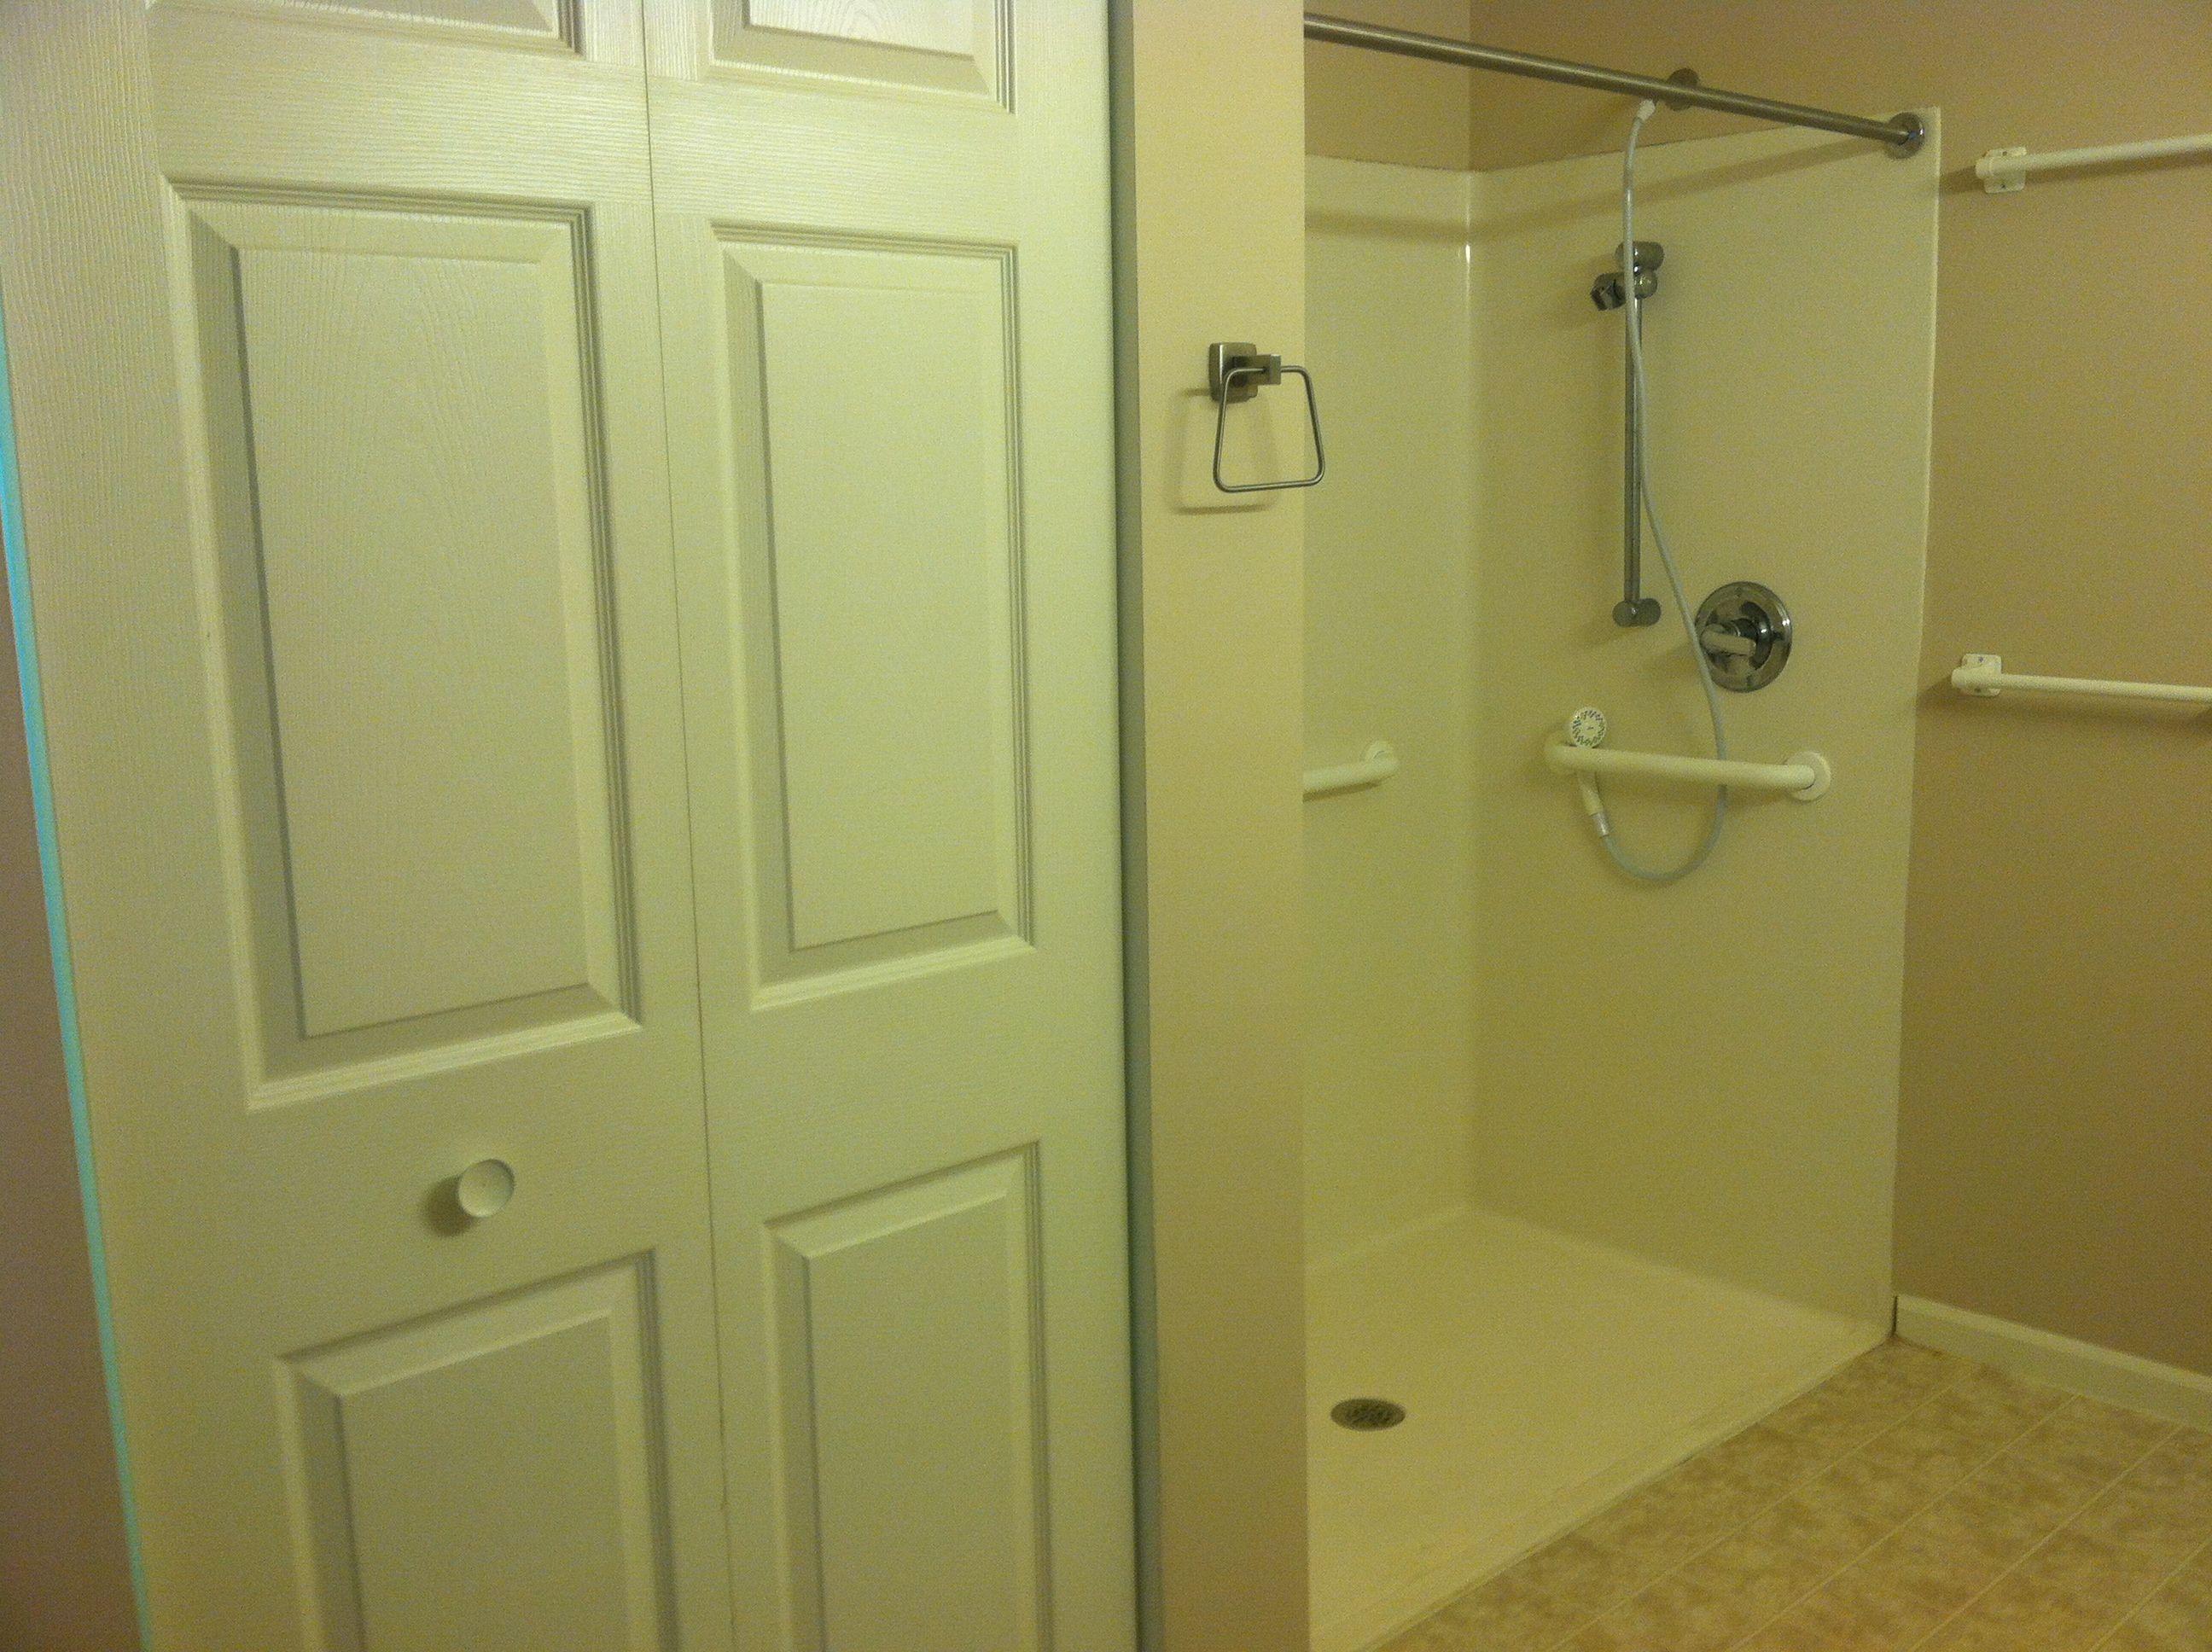 Kitchen And Bathroom Checklist For Senior Independent